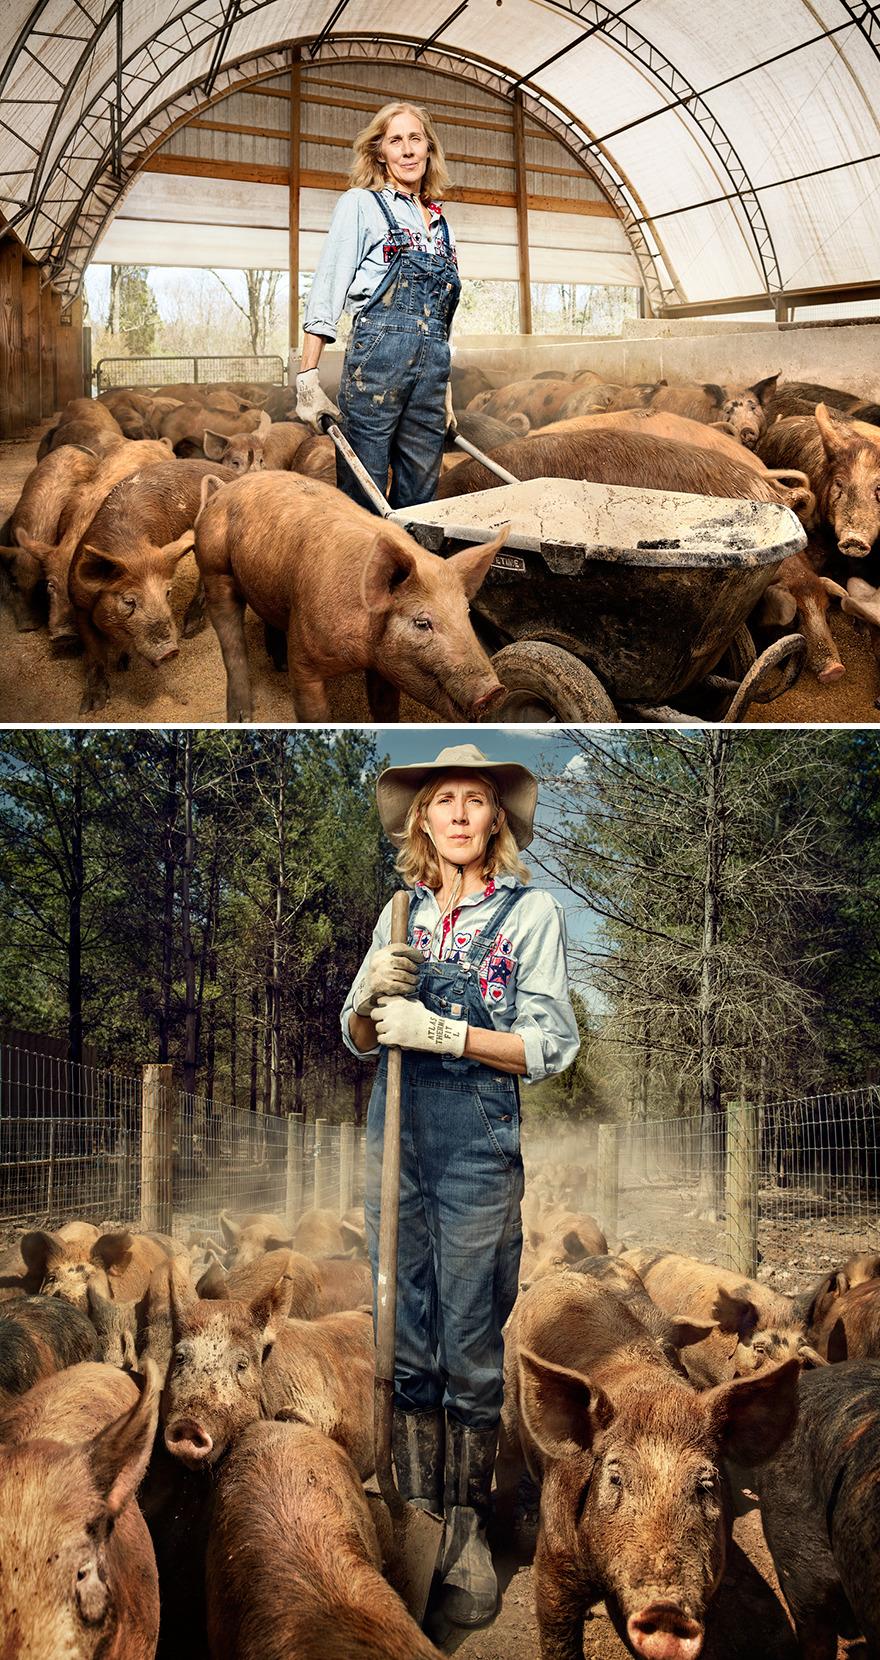 Nancy Poli, Pig Farmer At Stryker Farms In Saylorsburg, Pennsylvania